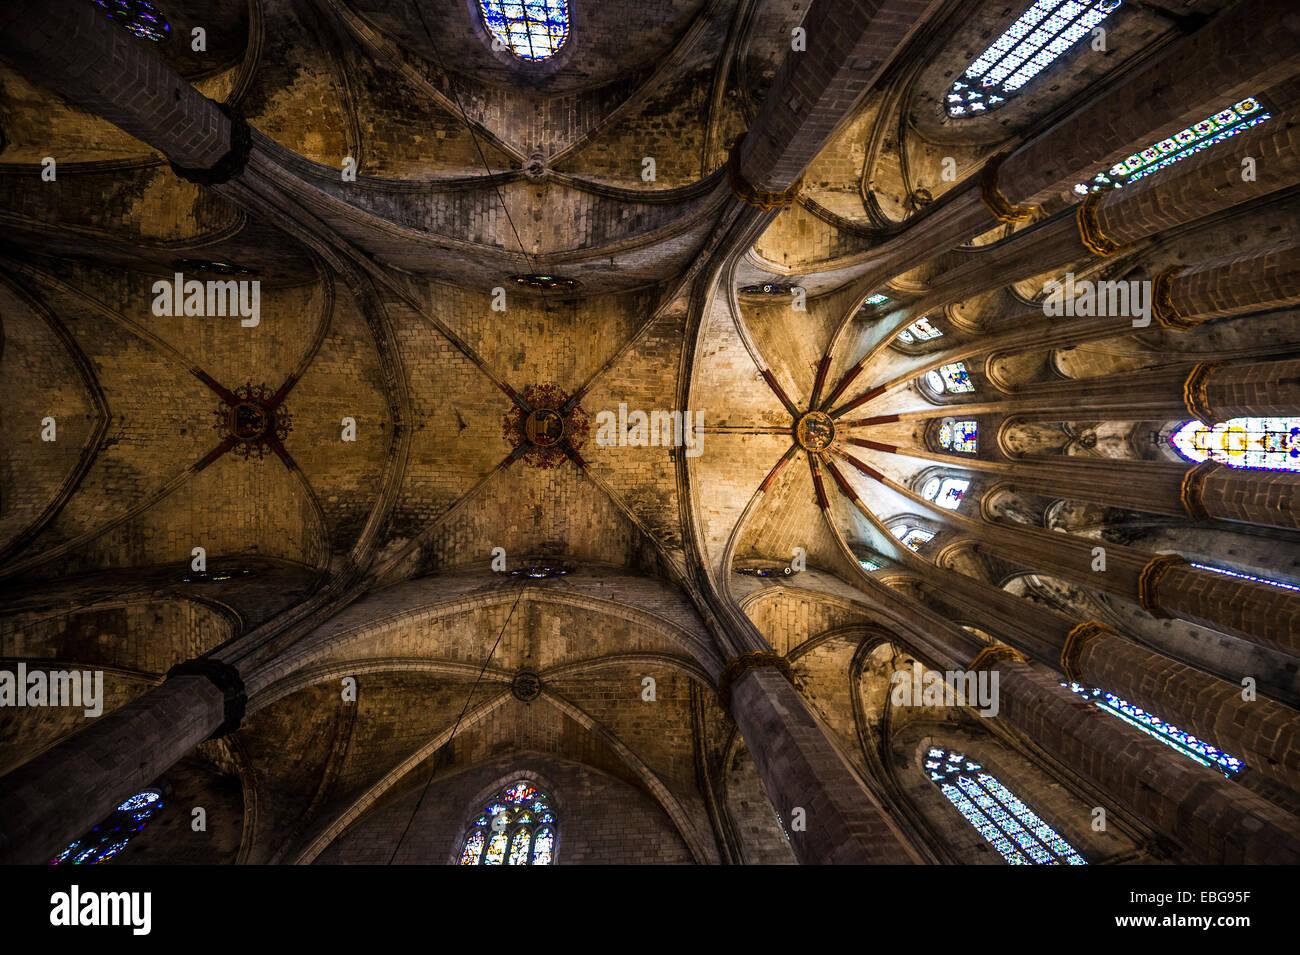 Eglesia de Santa Maria del Mar, El Born, Barcelona, Katalonien, Spanien Stockbild